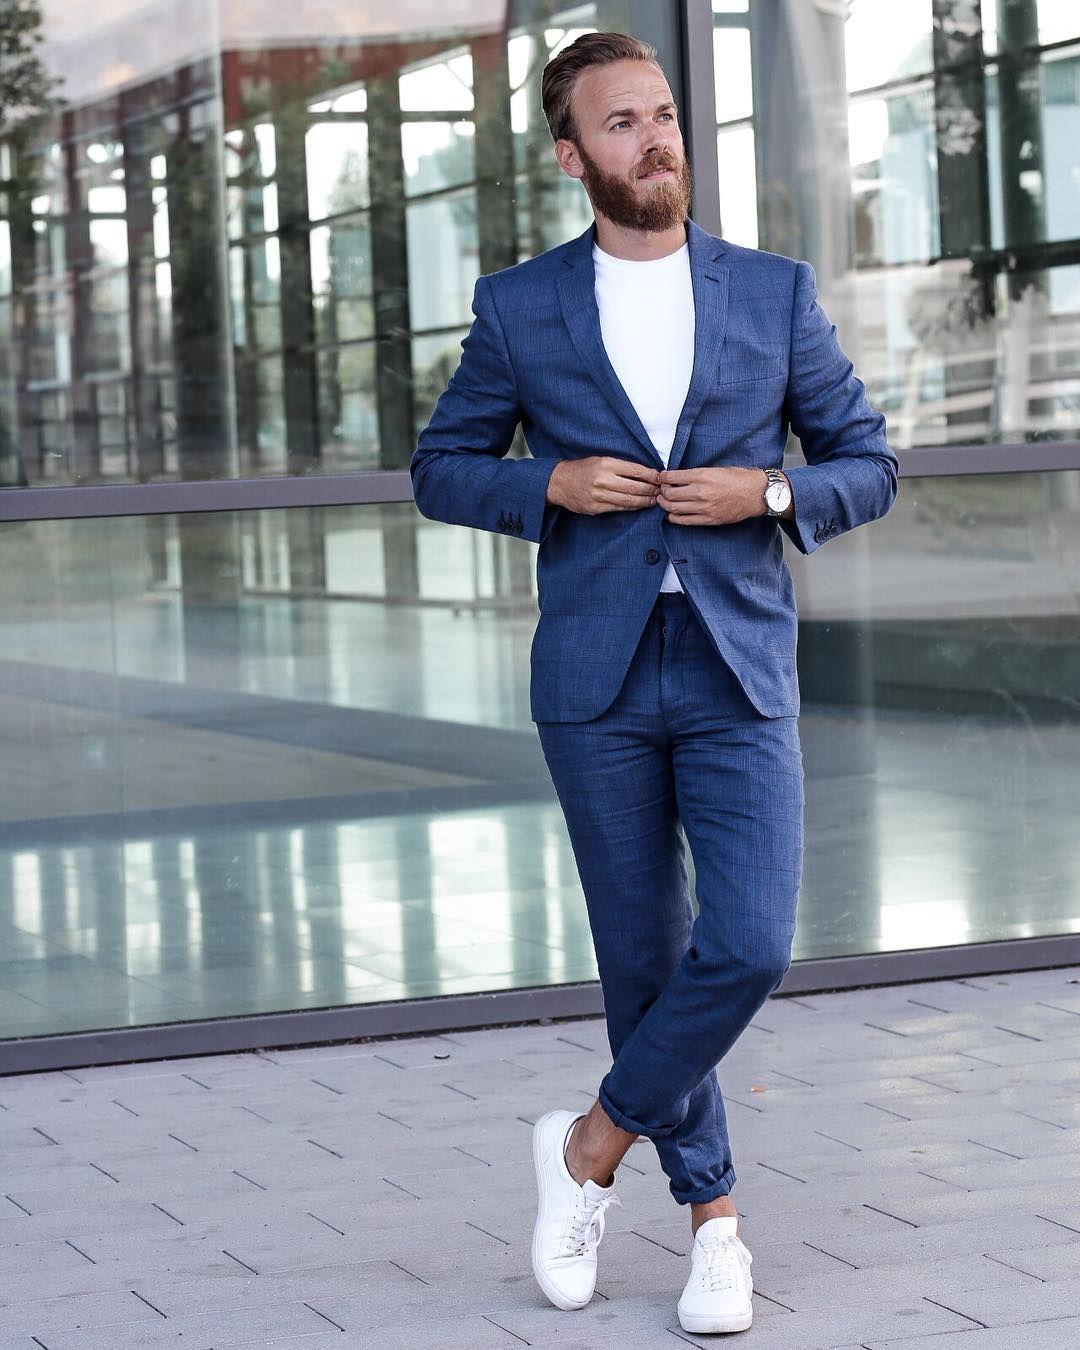 5407b23b8dd  Anzeige  Fashion - Maßgeschneider Anzug von  hockerty.men ⚜  hockerty   hockertyshirt  hockertysuit  menwithclass  measured  linensuit…